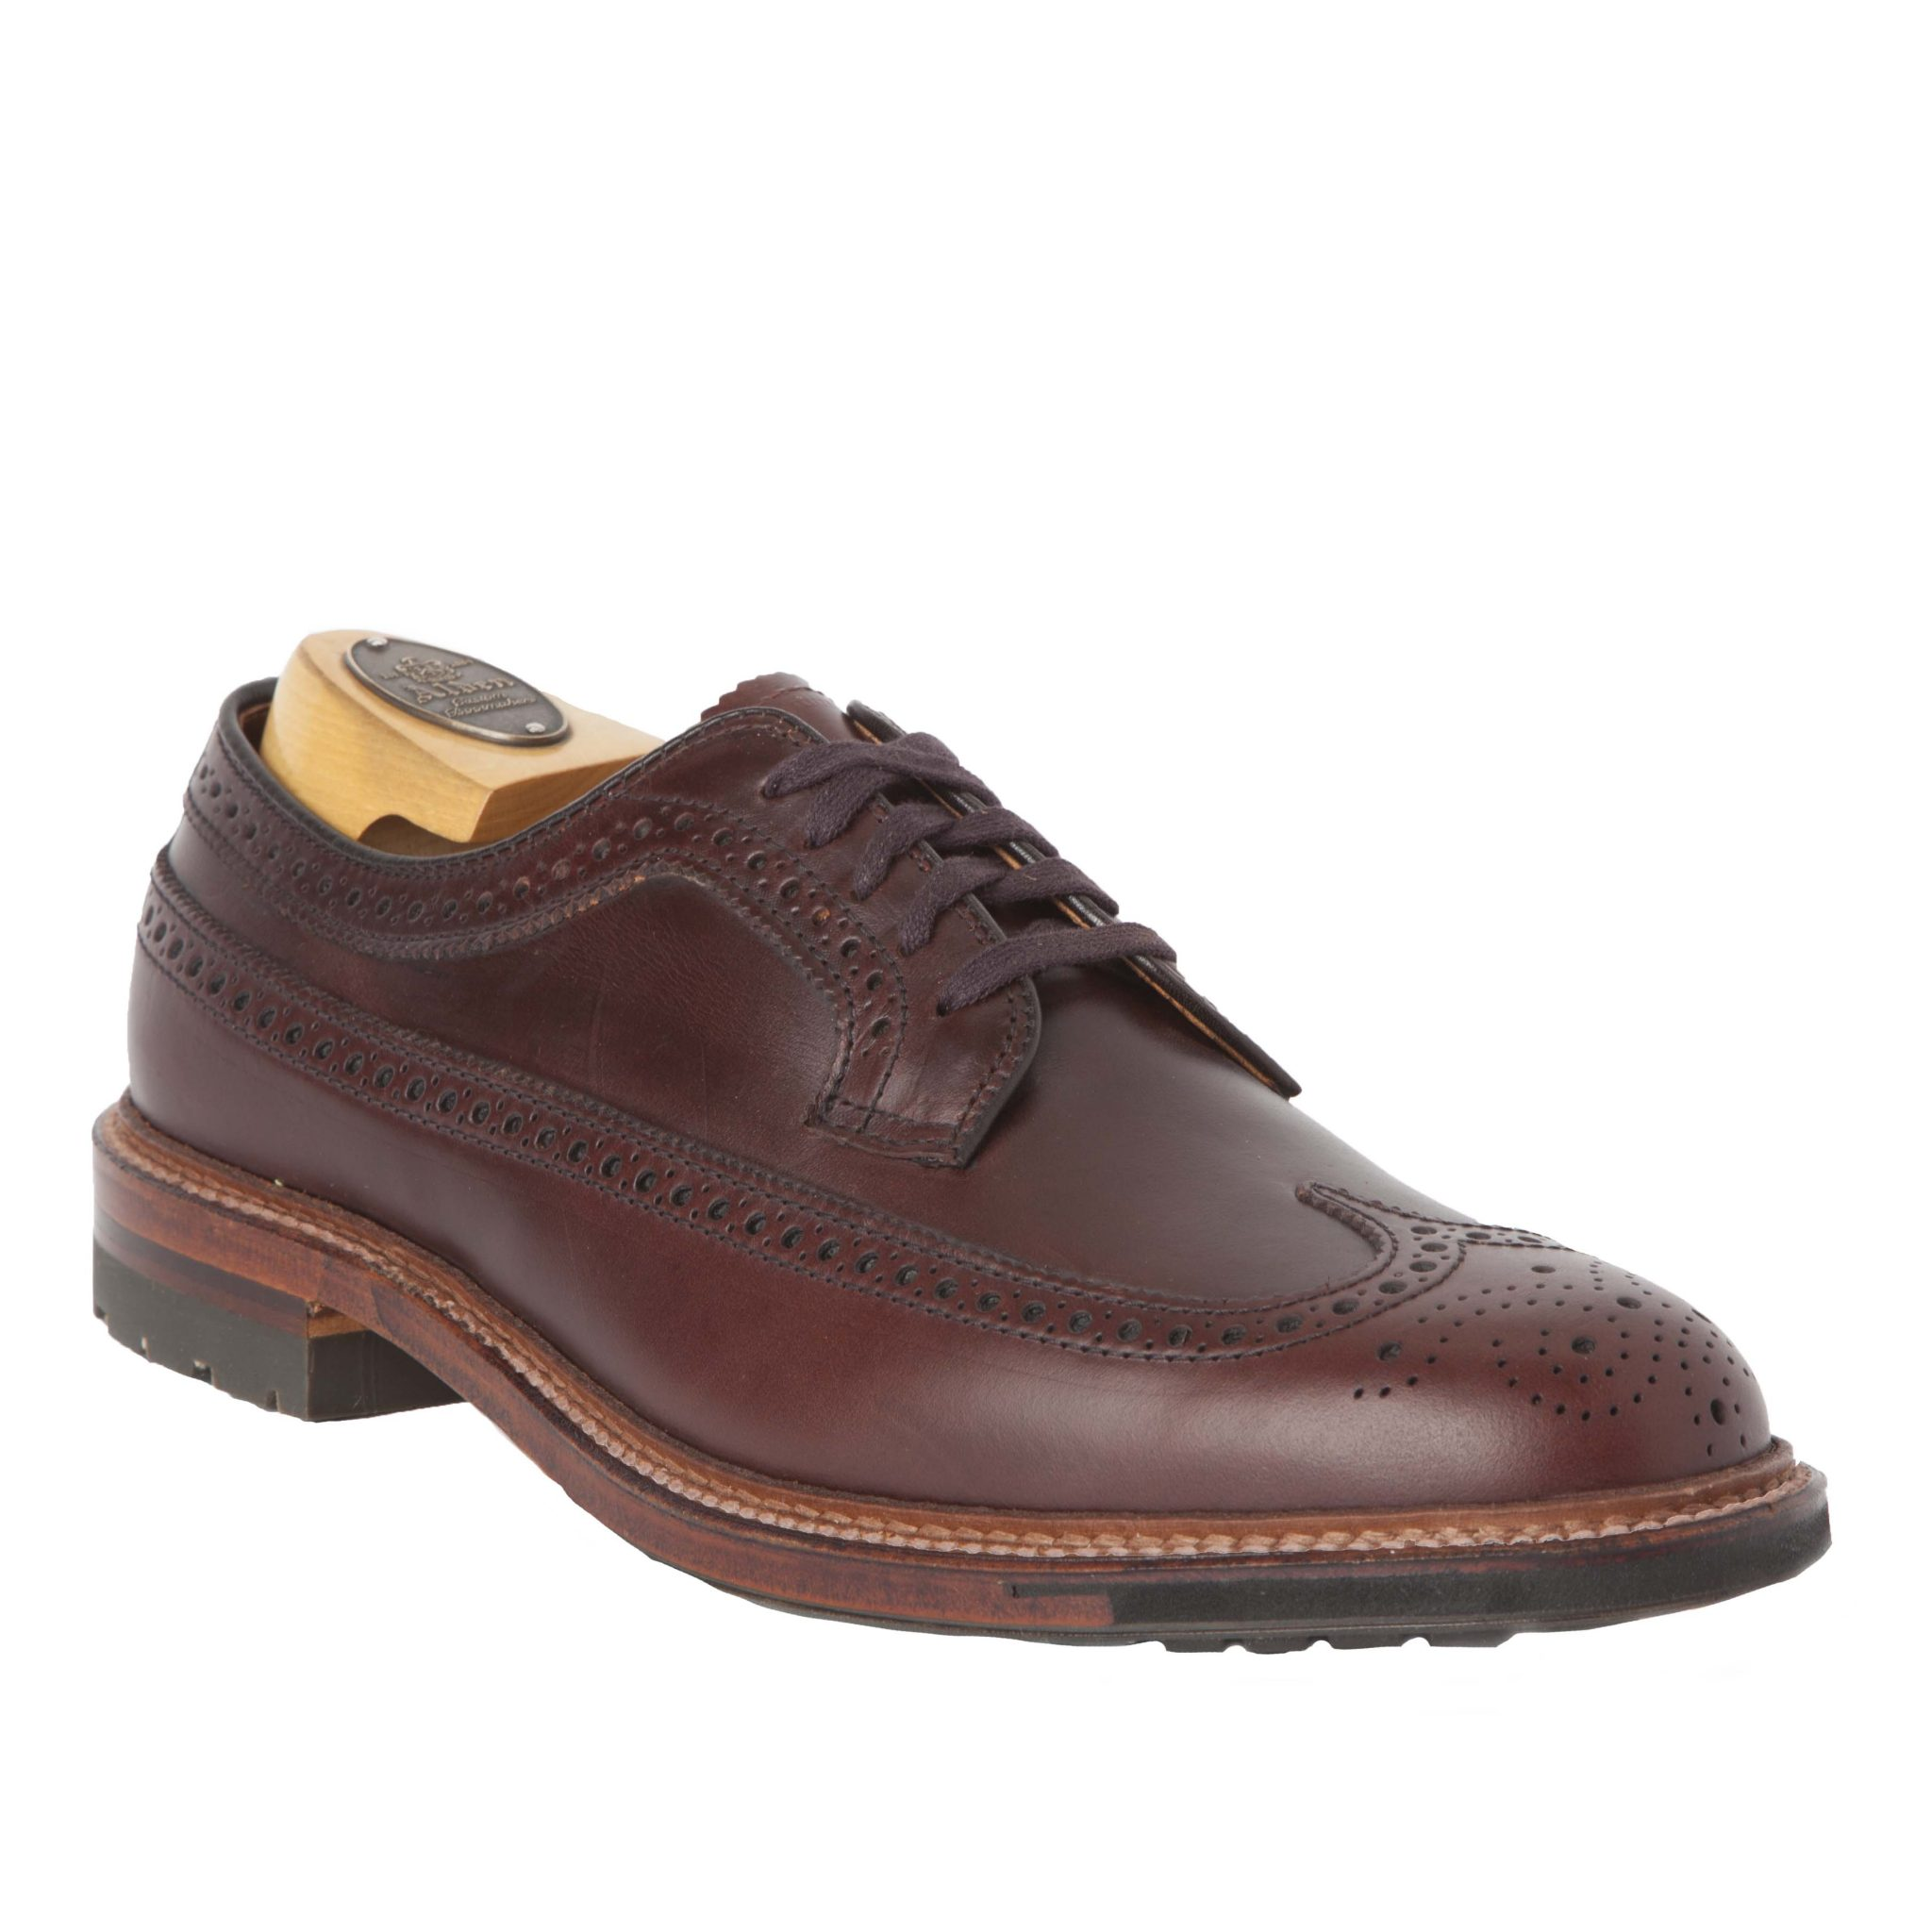 FOOTWEAR - Lace-up shoes Alden IddG7IyBx